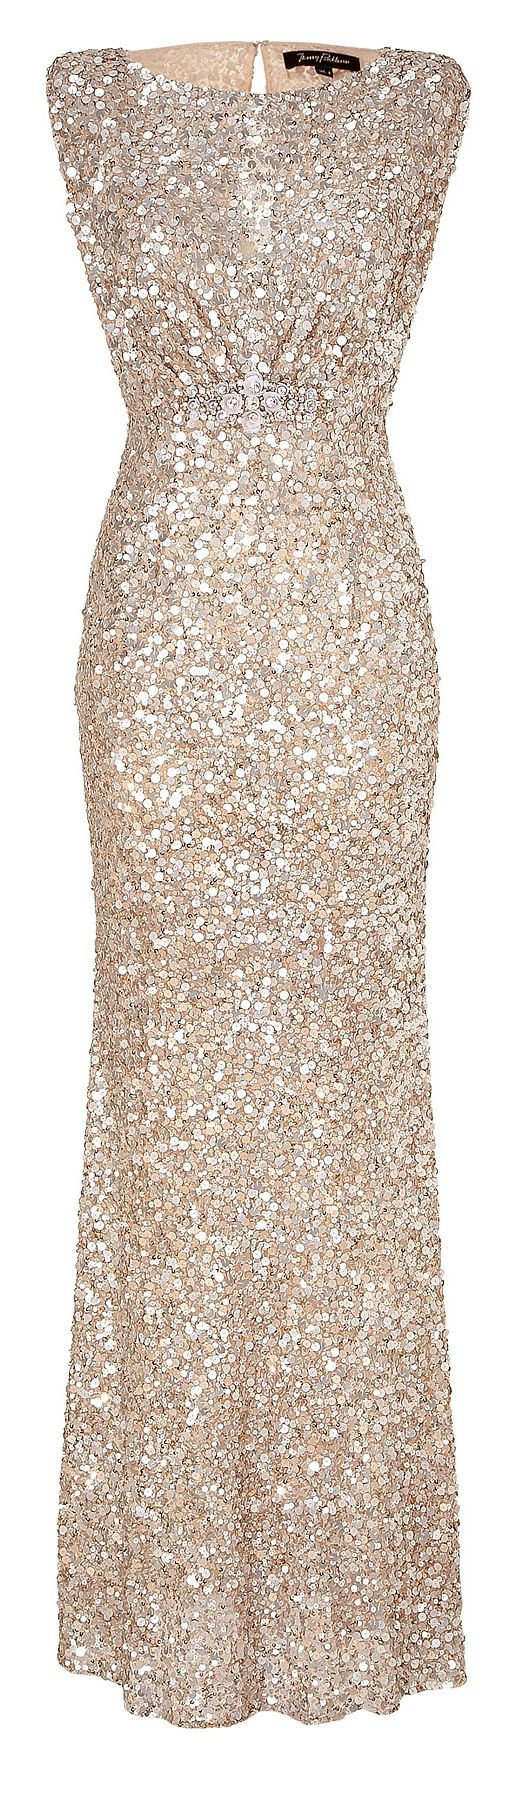 Jenny Packham Soft Gold Sleeveless Sequin Dress